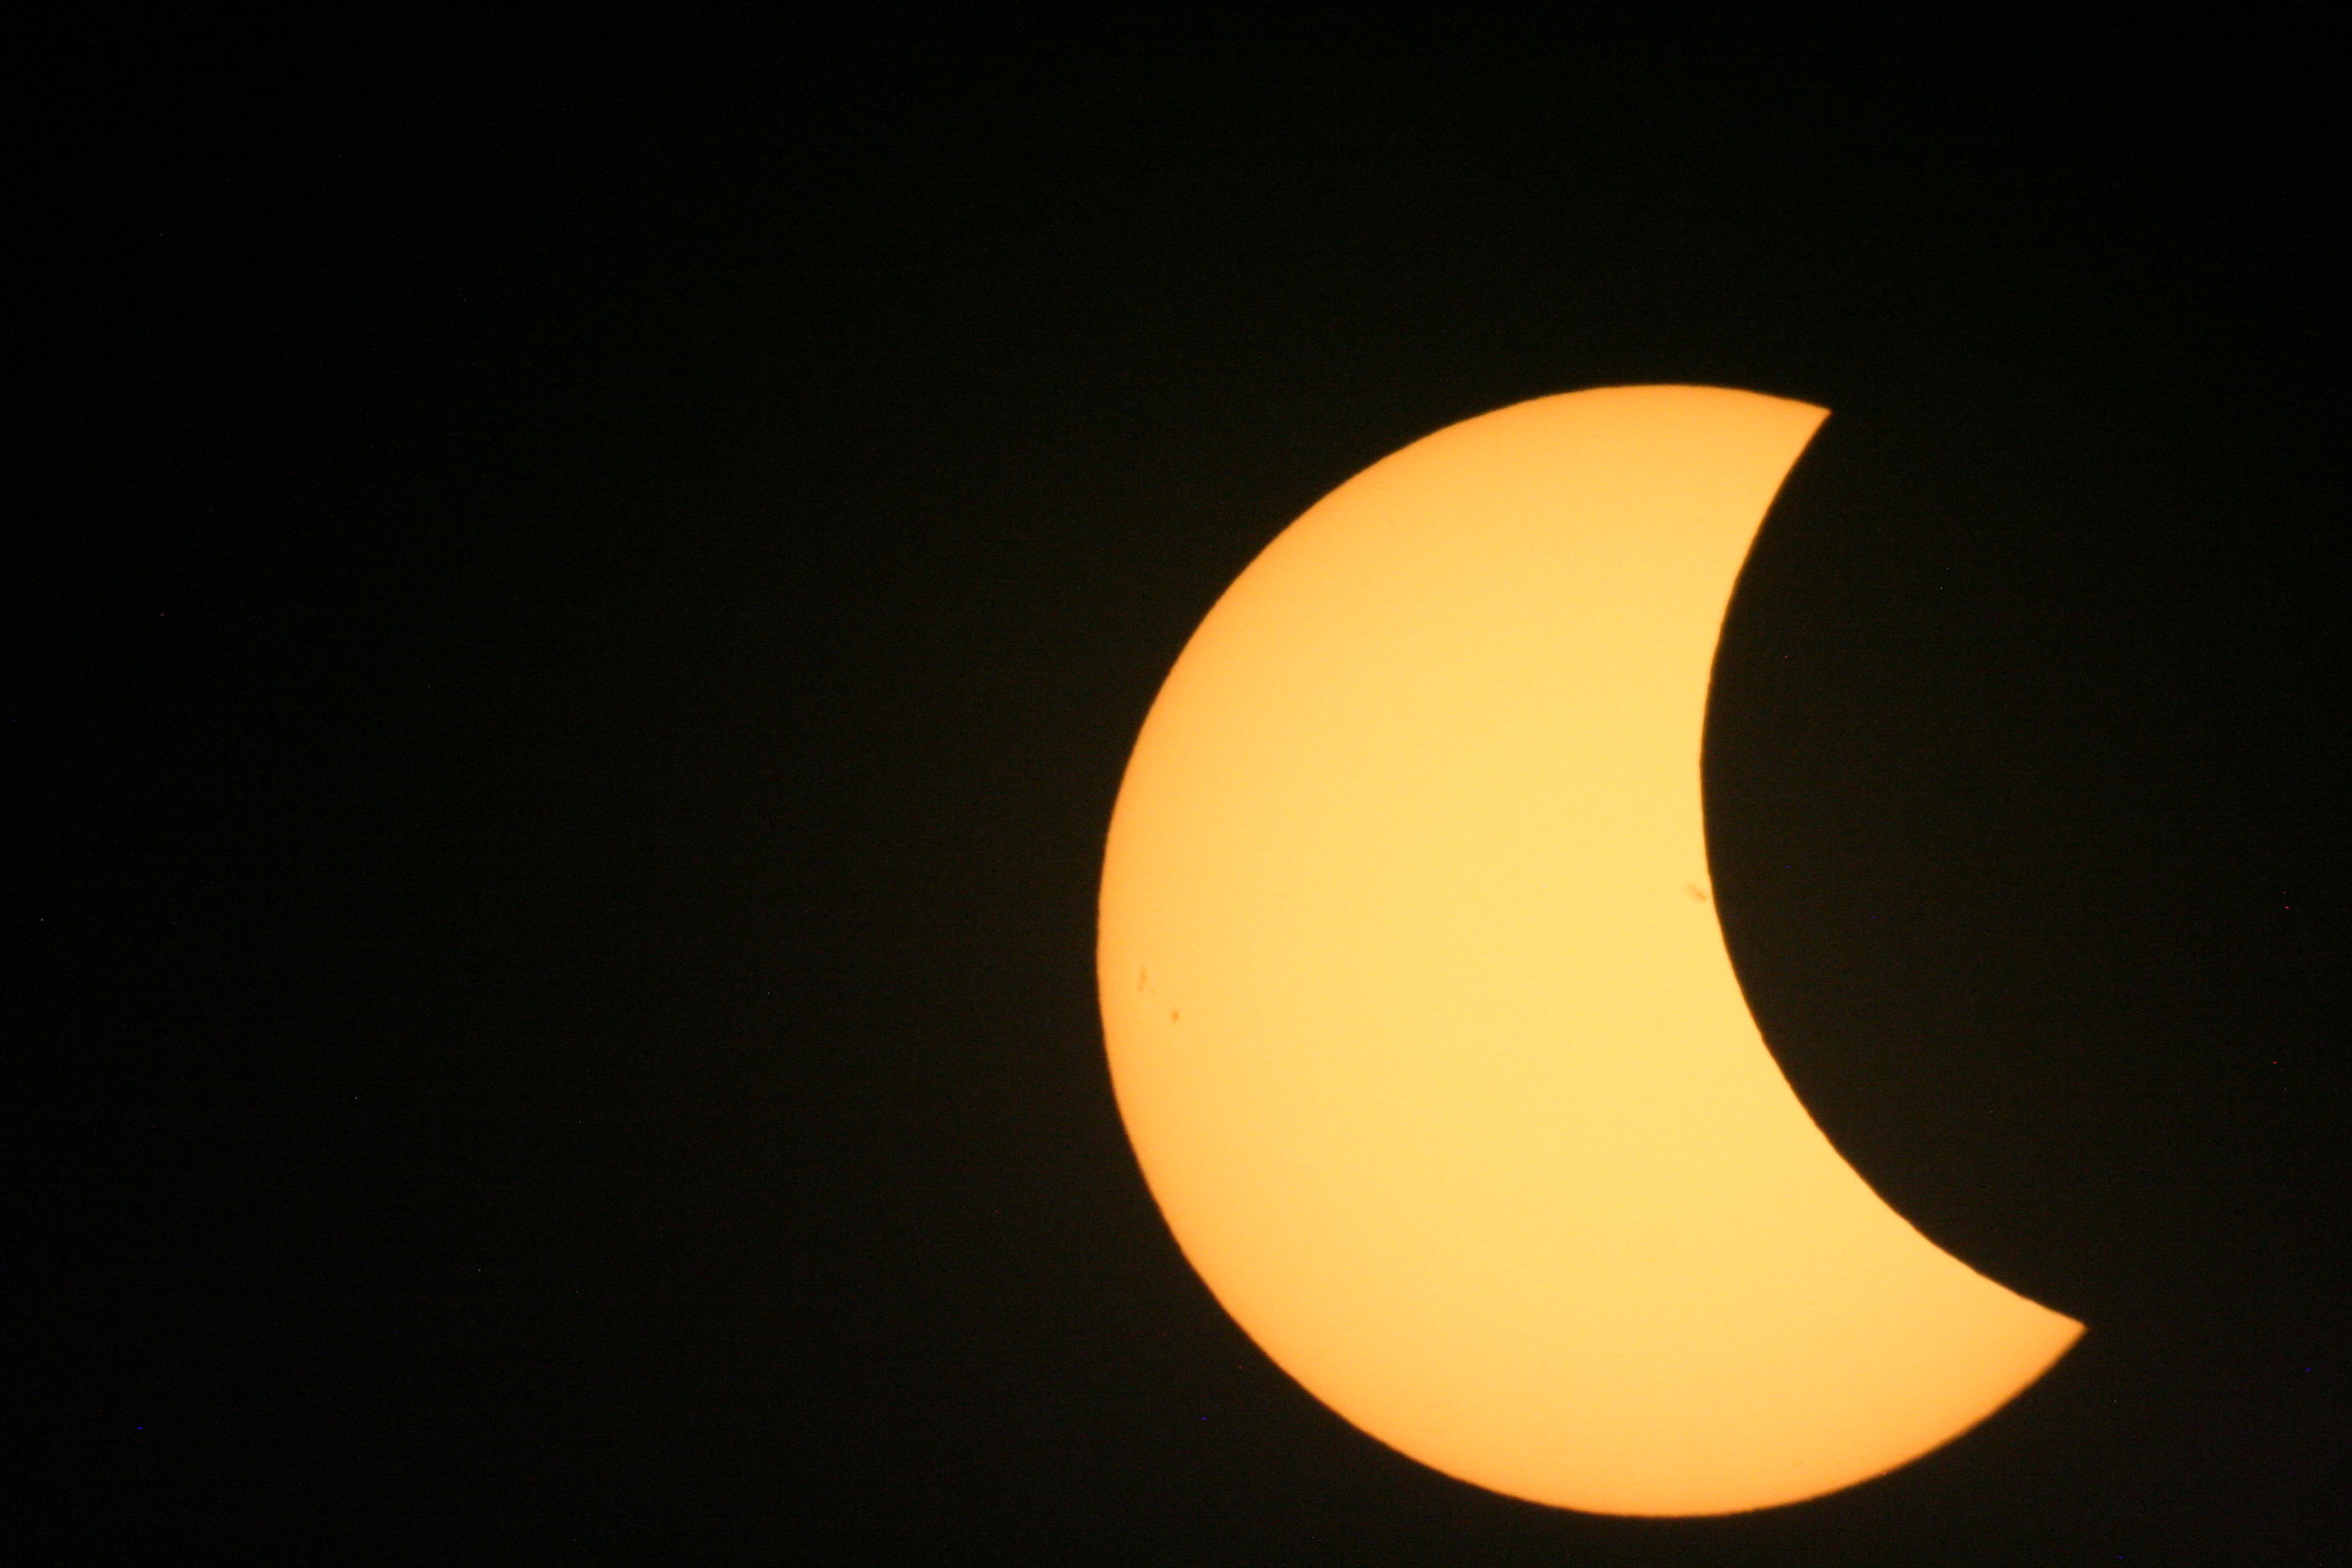 Sunspot Occultation